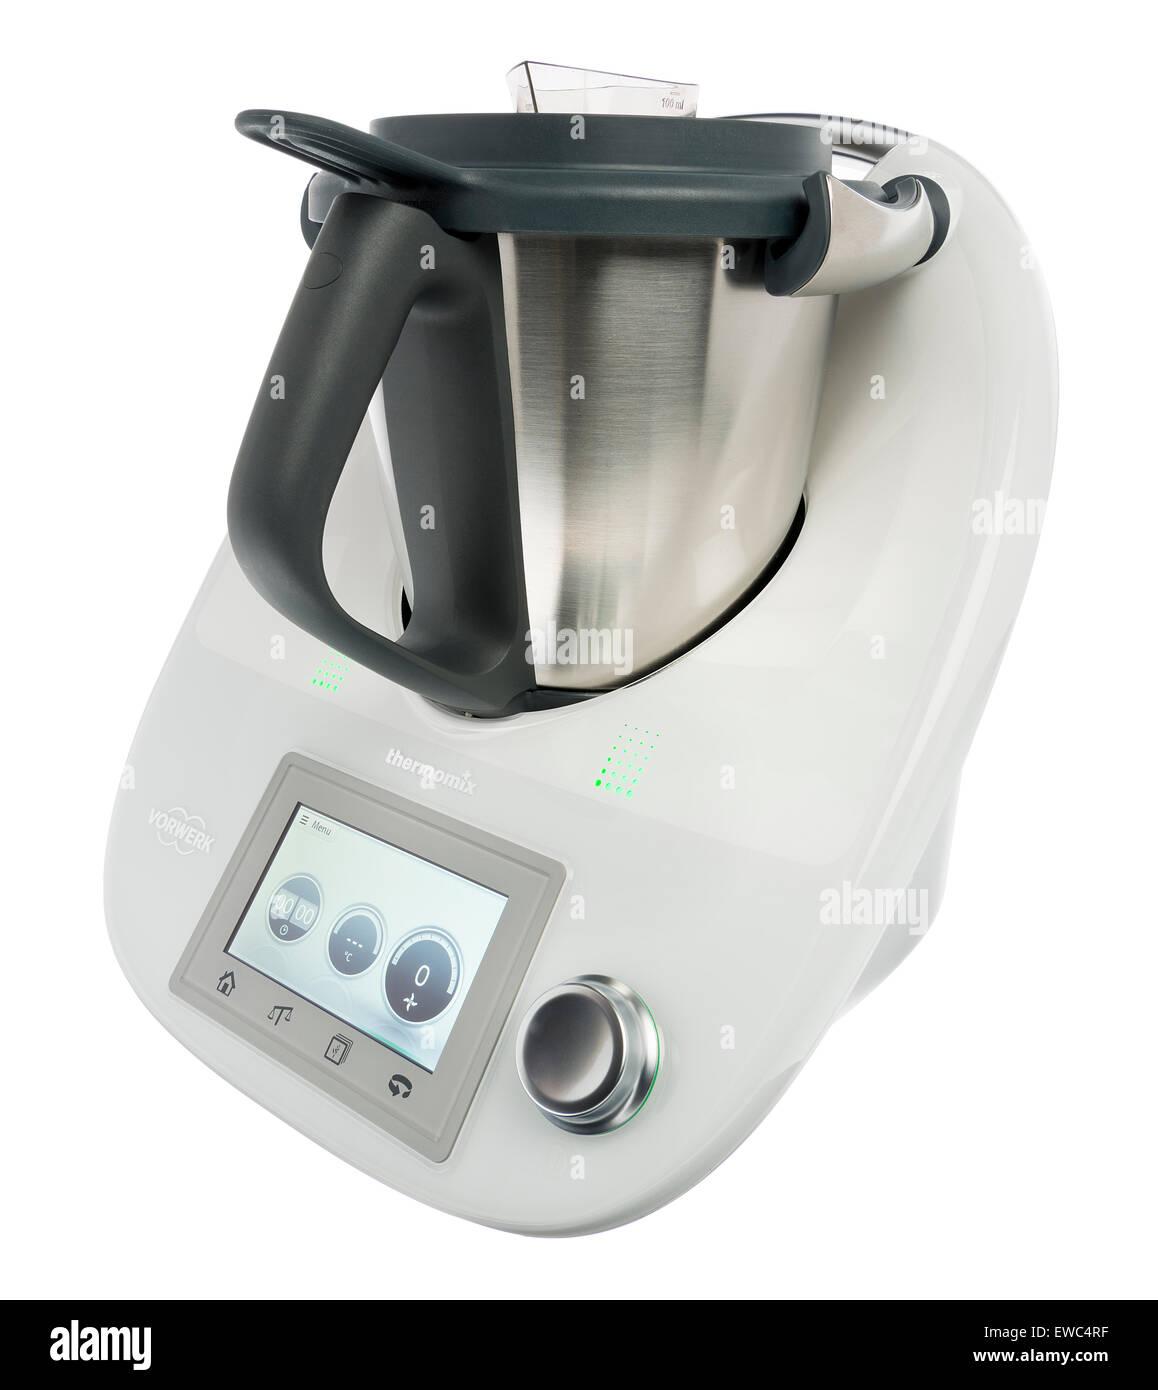 Uncategorized Thermomix Kitchen Appliance thermomix kitchen device food processor appliance stock photo appliance